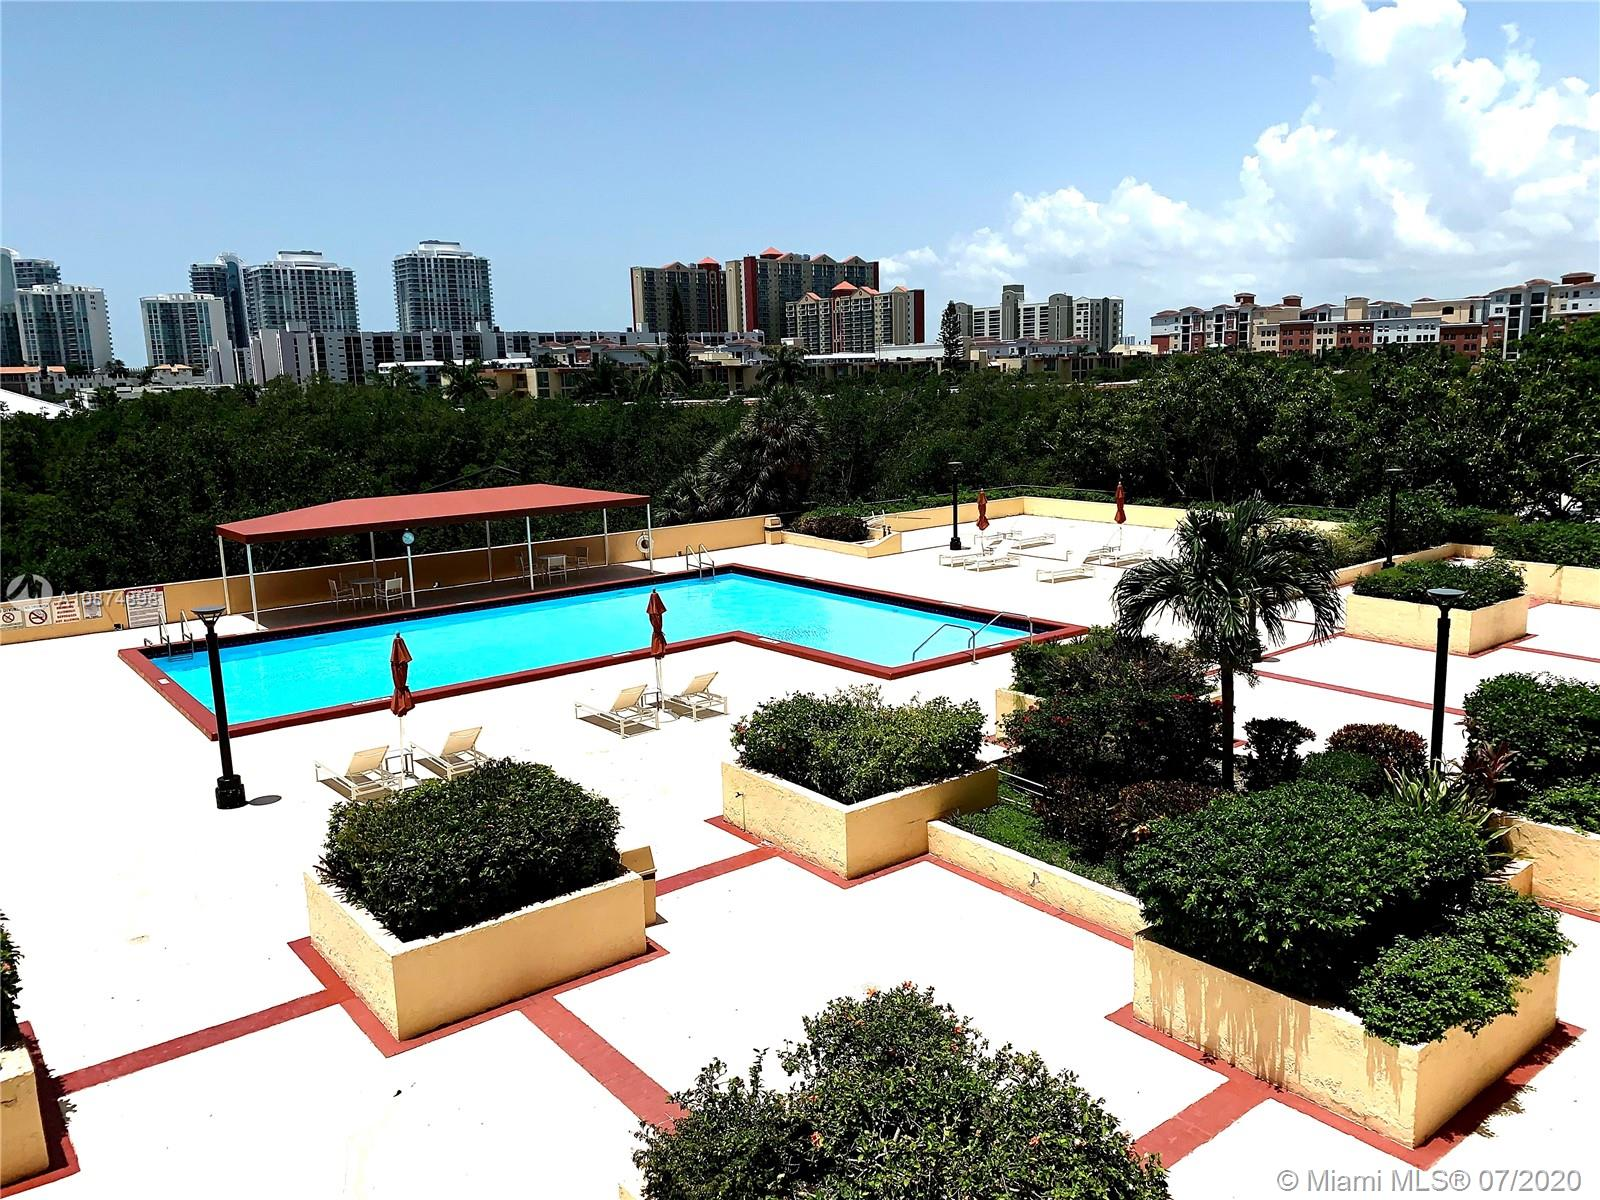 Winston Tower 600 #508 - 210 174th St #508, Sunny Isles Beach, FL 33160